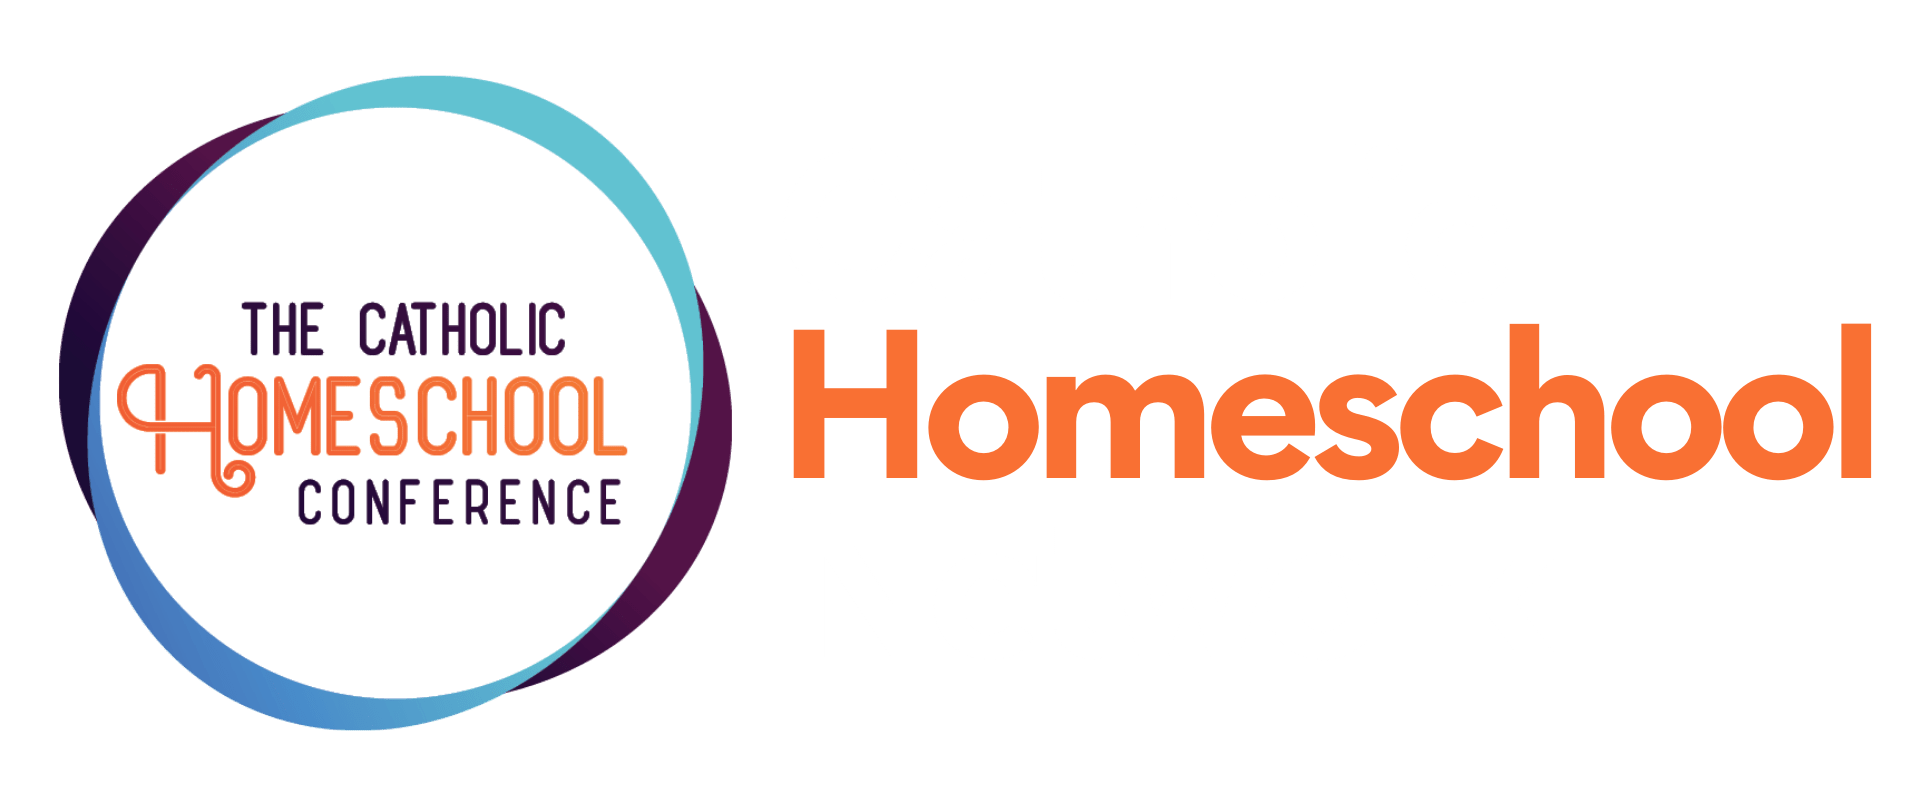 Catholic Homeschooling Conference